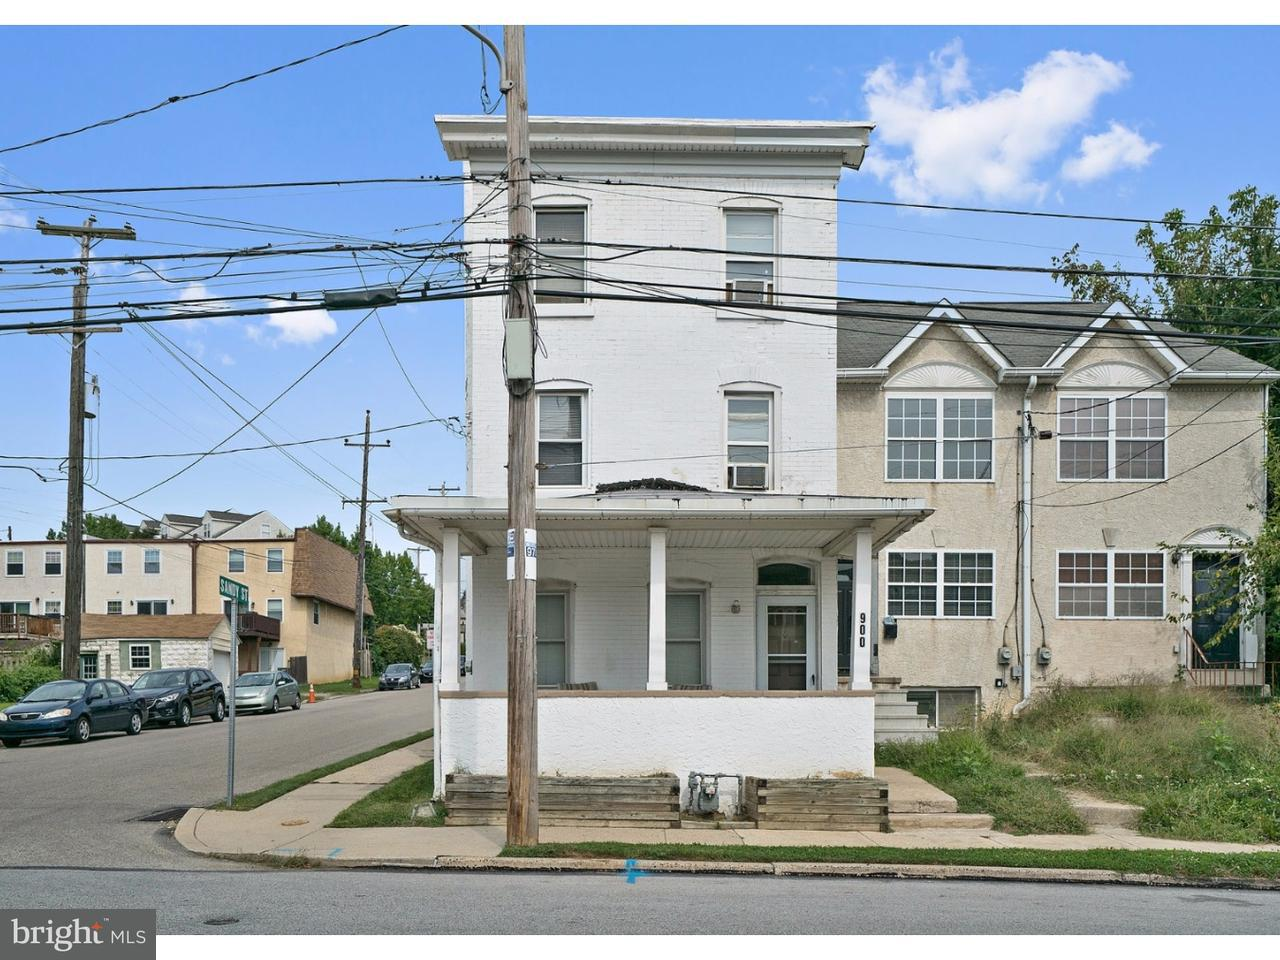 Single Family Home for Sale at 900 E HECTOR Street Conshohocken, Pennsylvania 19428 United States